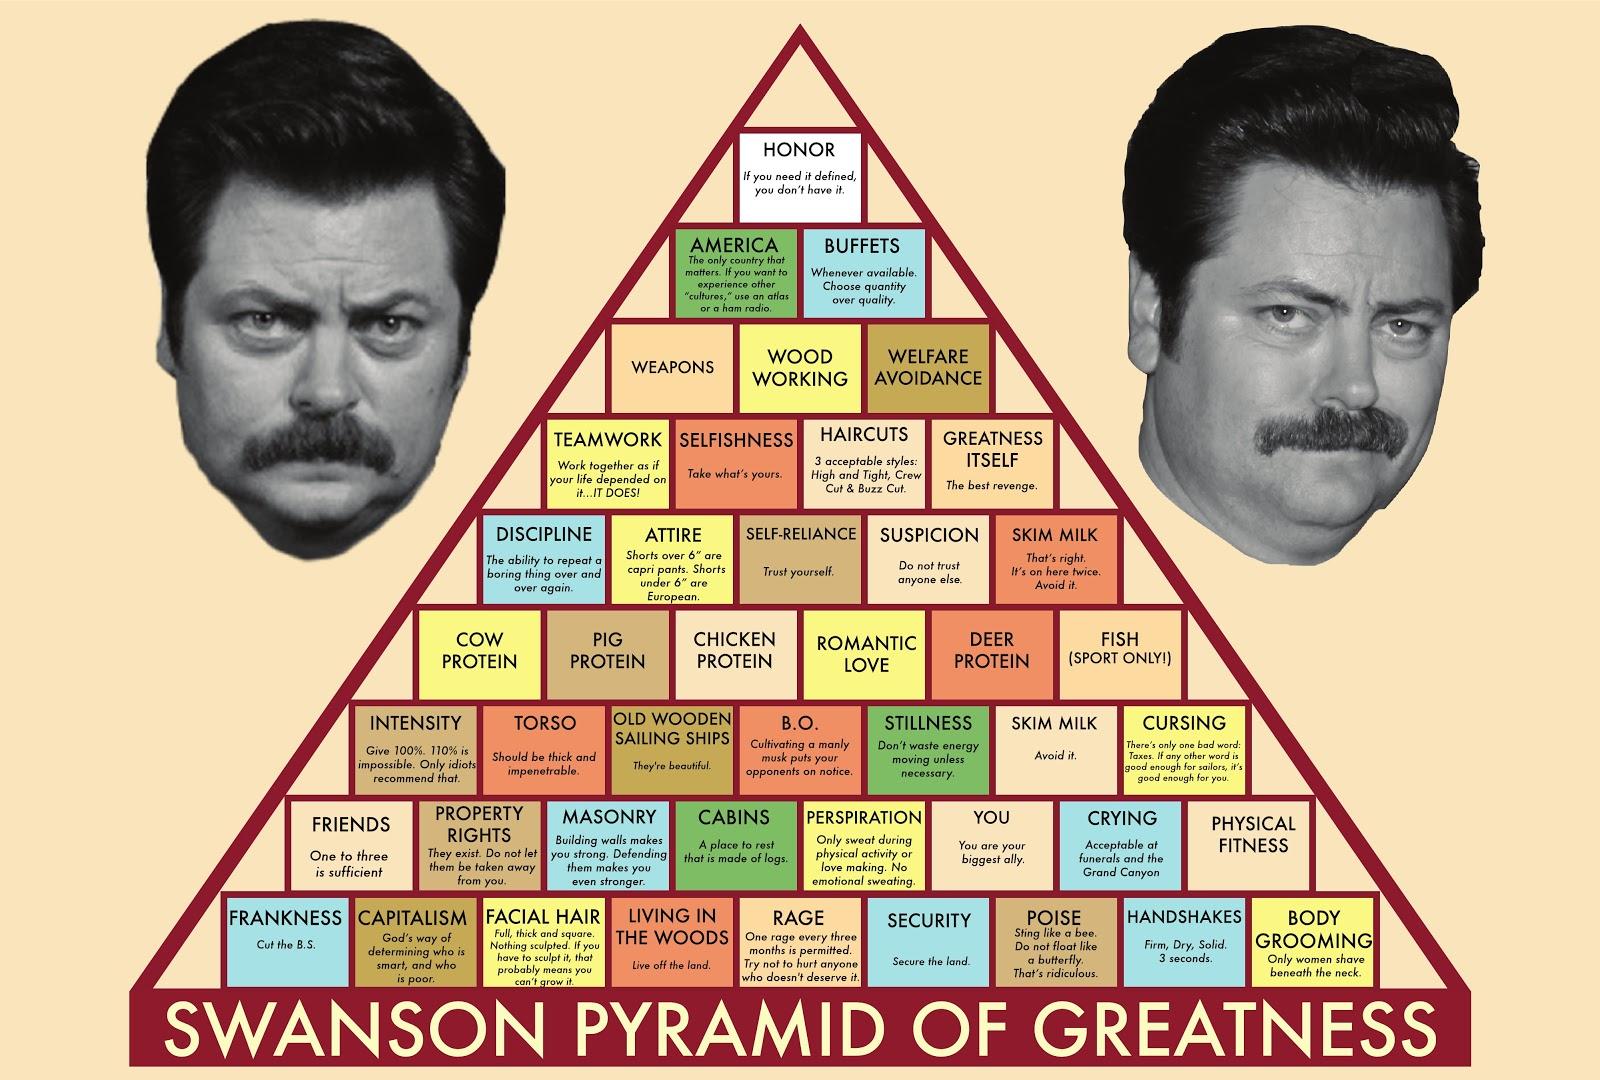 IMAGE(http://1.bp.blogspot.com/-u8Pfq04WVJA/TfbIdmWxBzI/AAAAAAAADYc/fLDHMPDmh0o/s1600/swanson-pyramid.jpg)